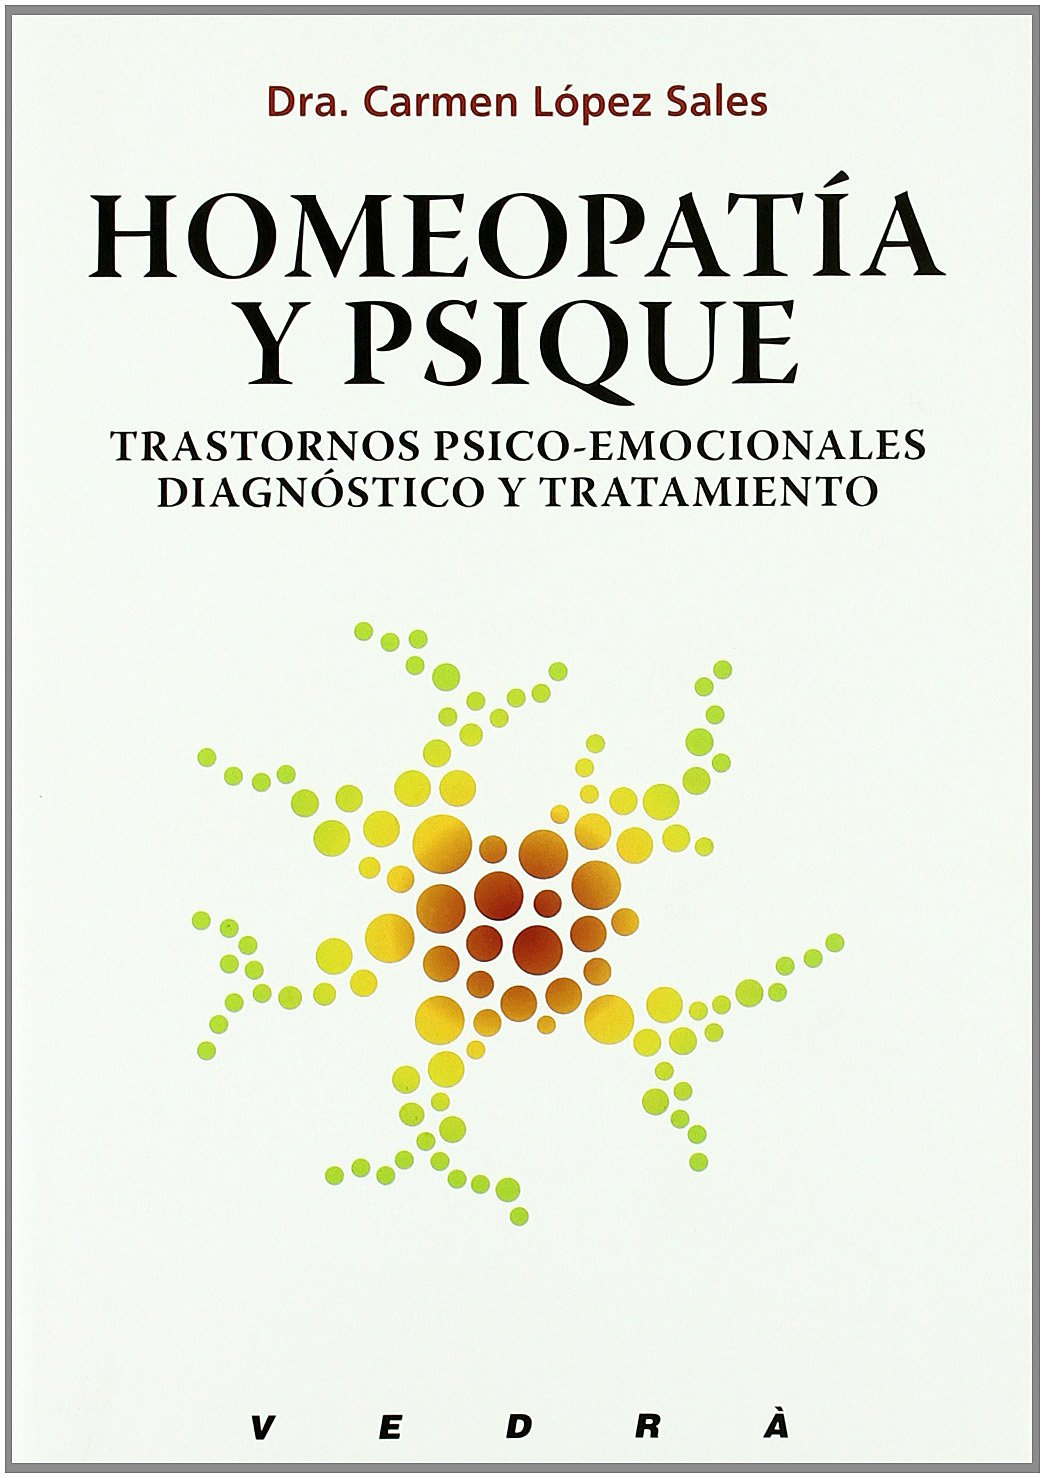 Homeopatía y psique (n.e.)